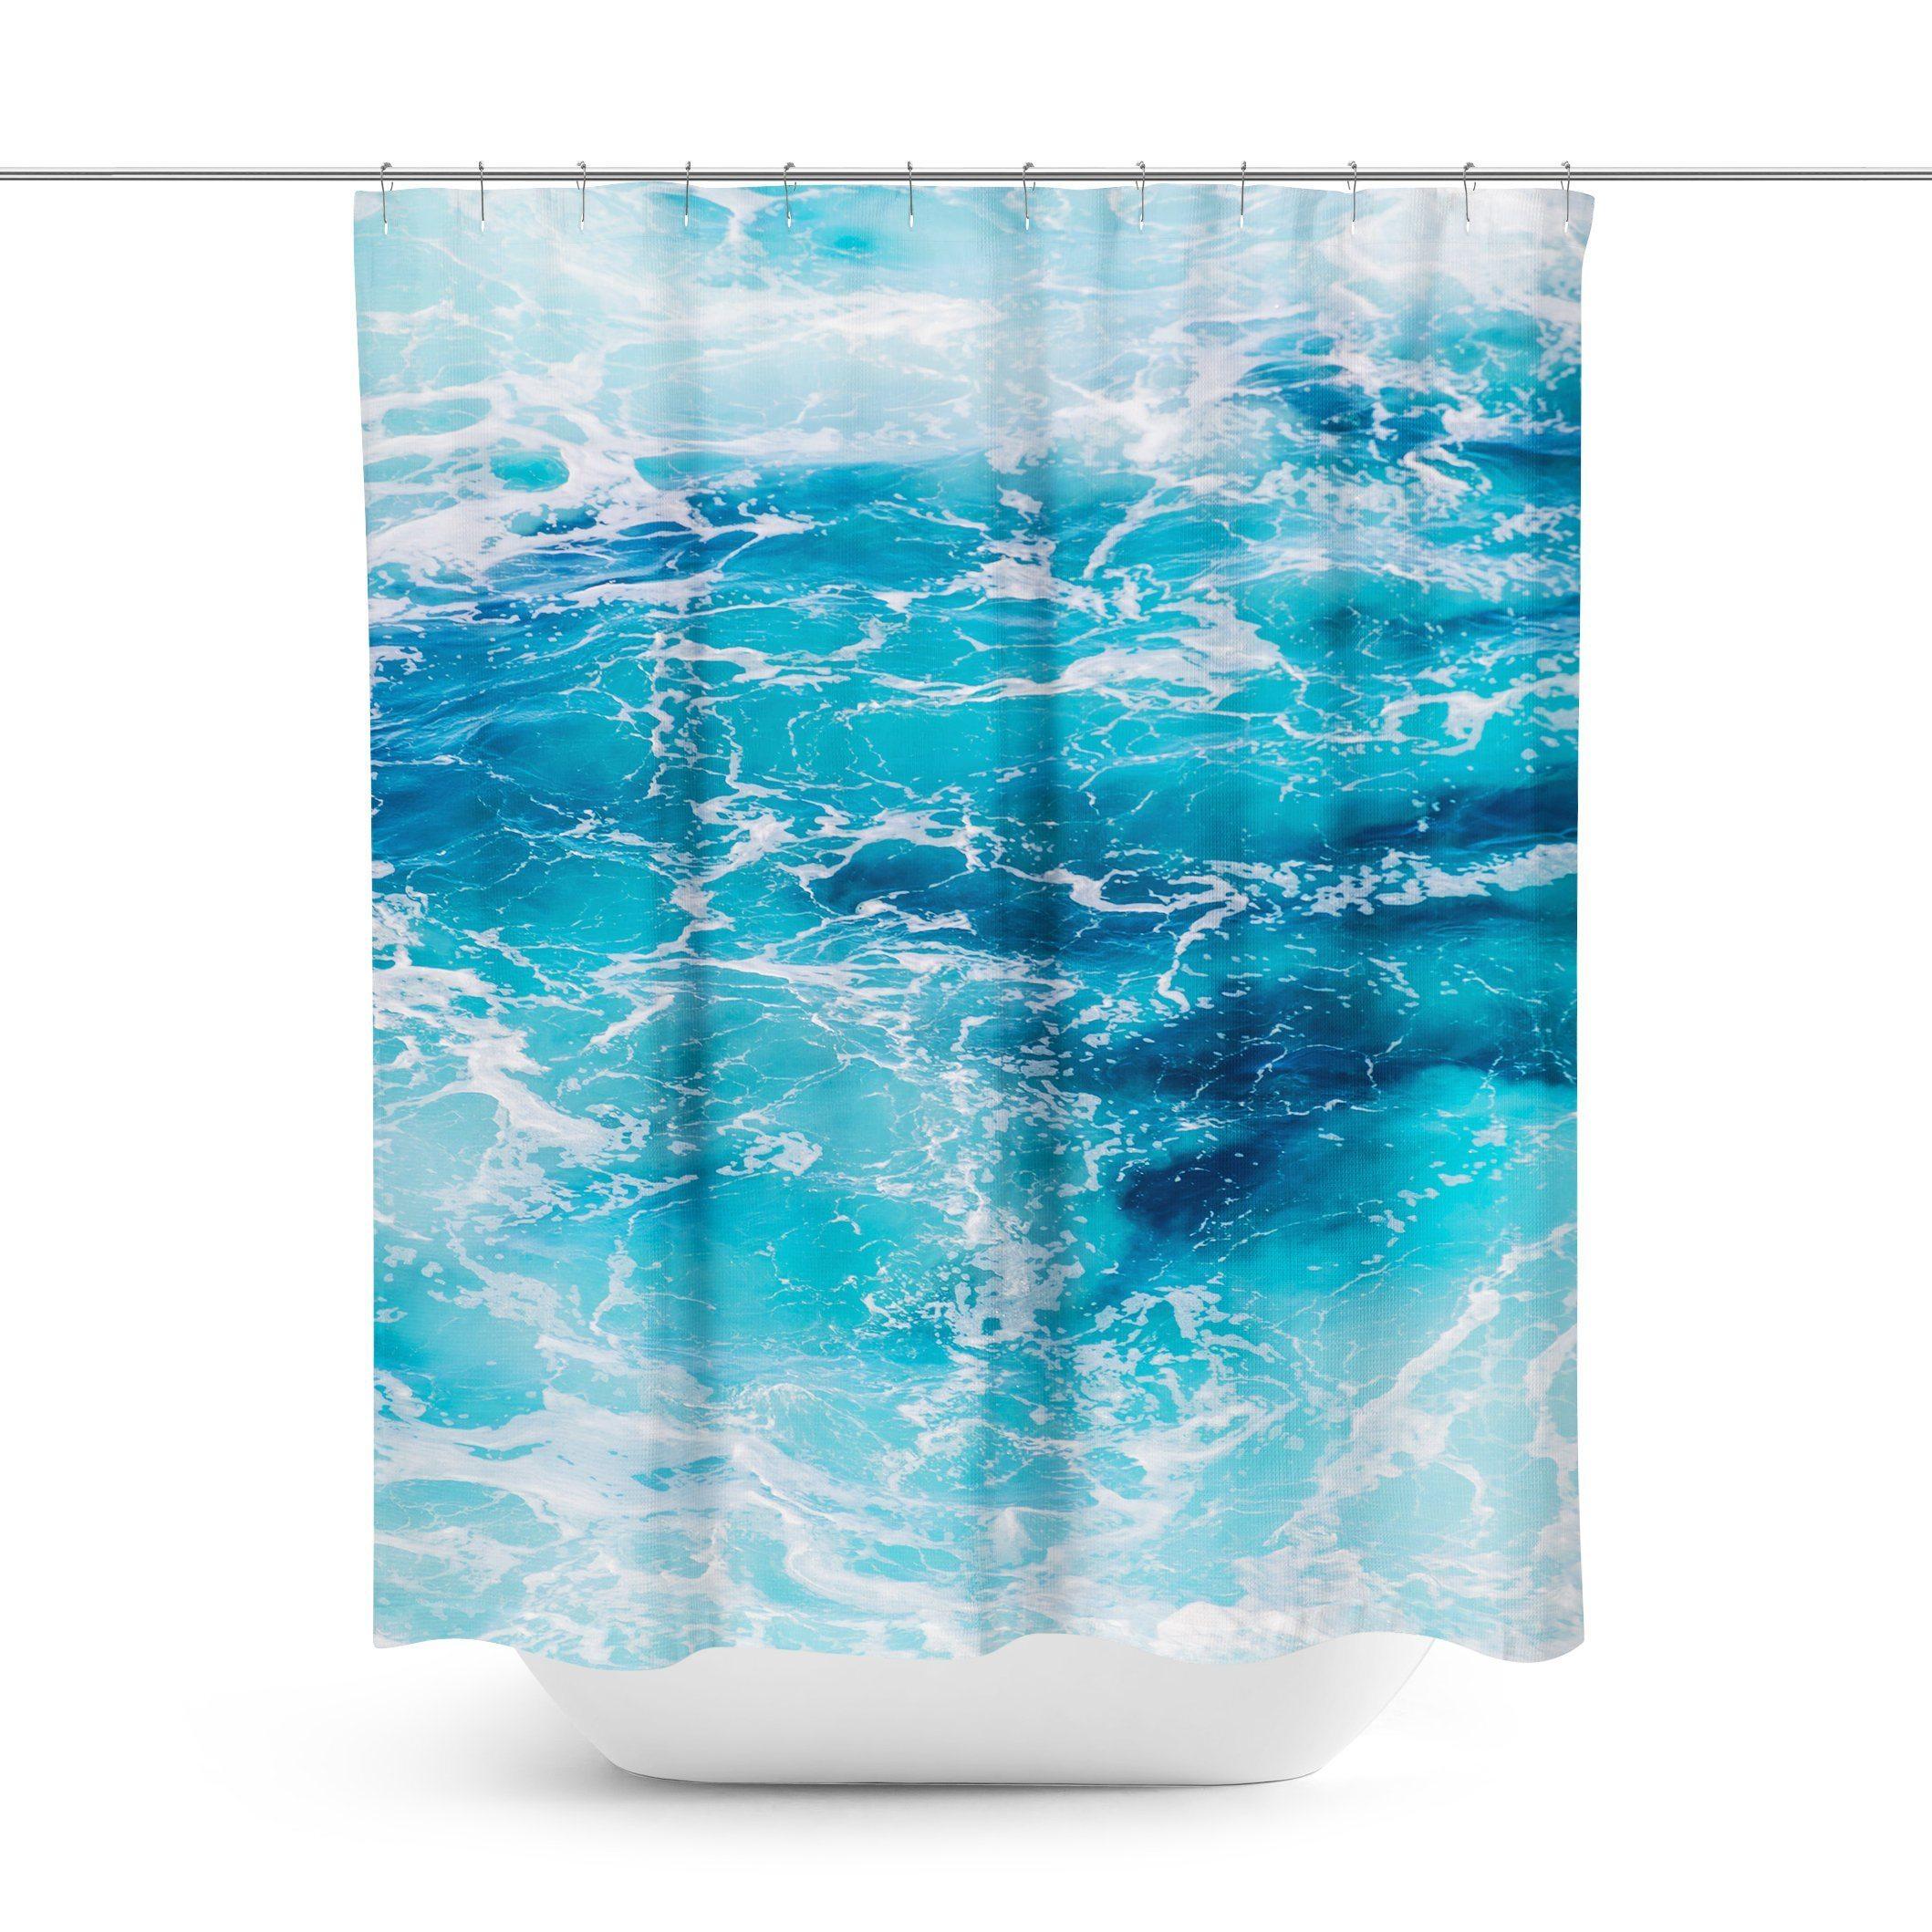 Ocean Wave Shower Curtain Curtains Ocean Waves Waves